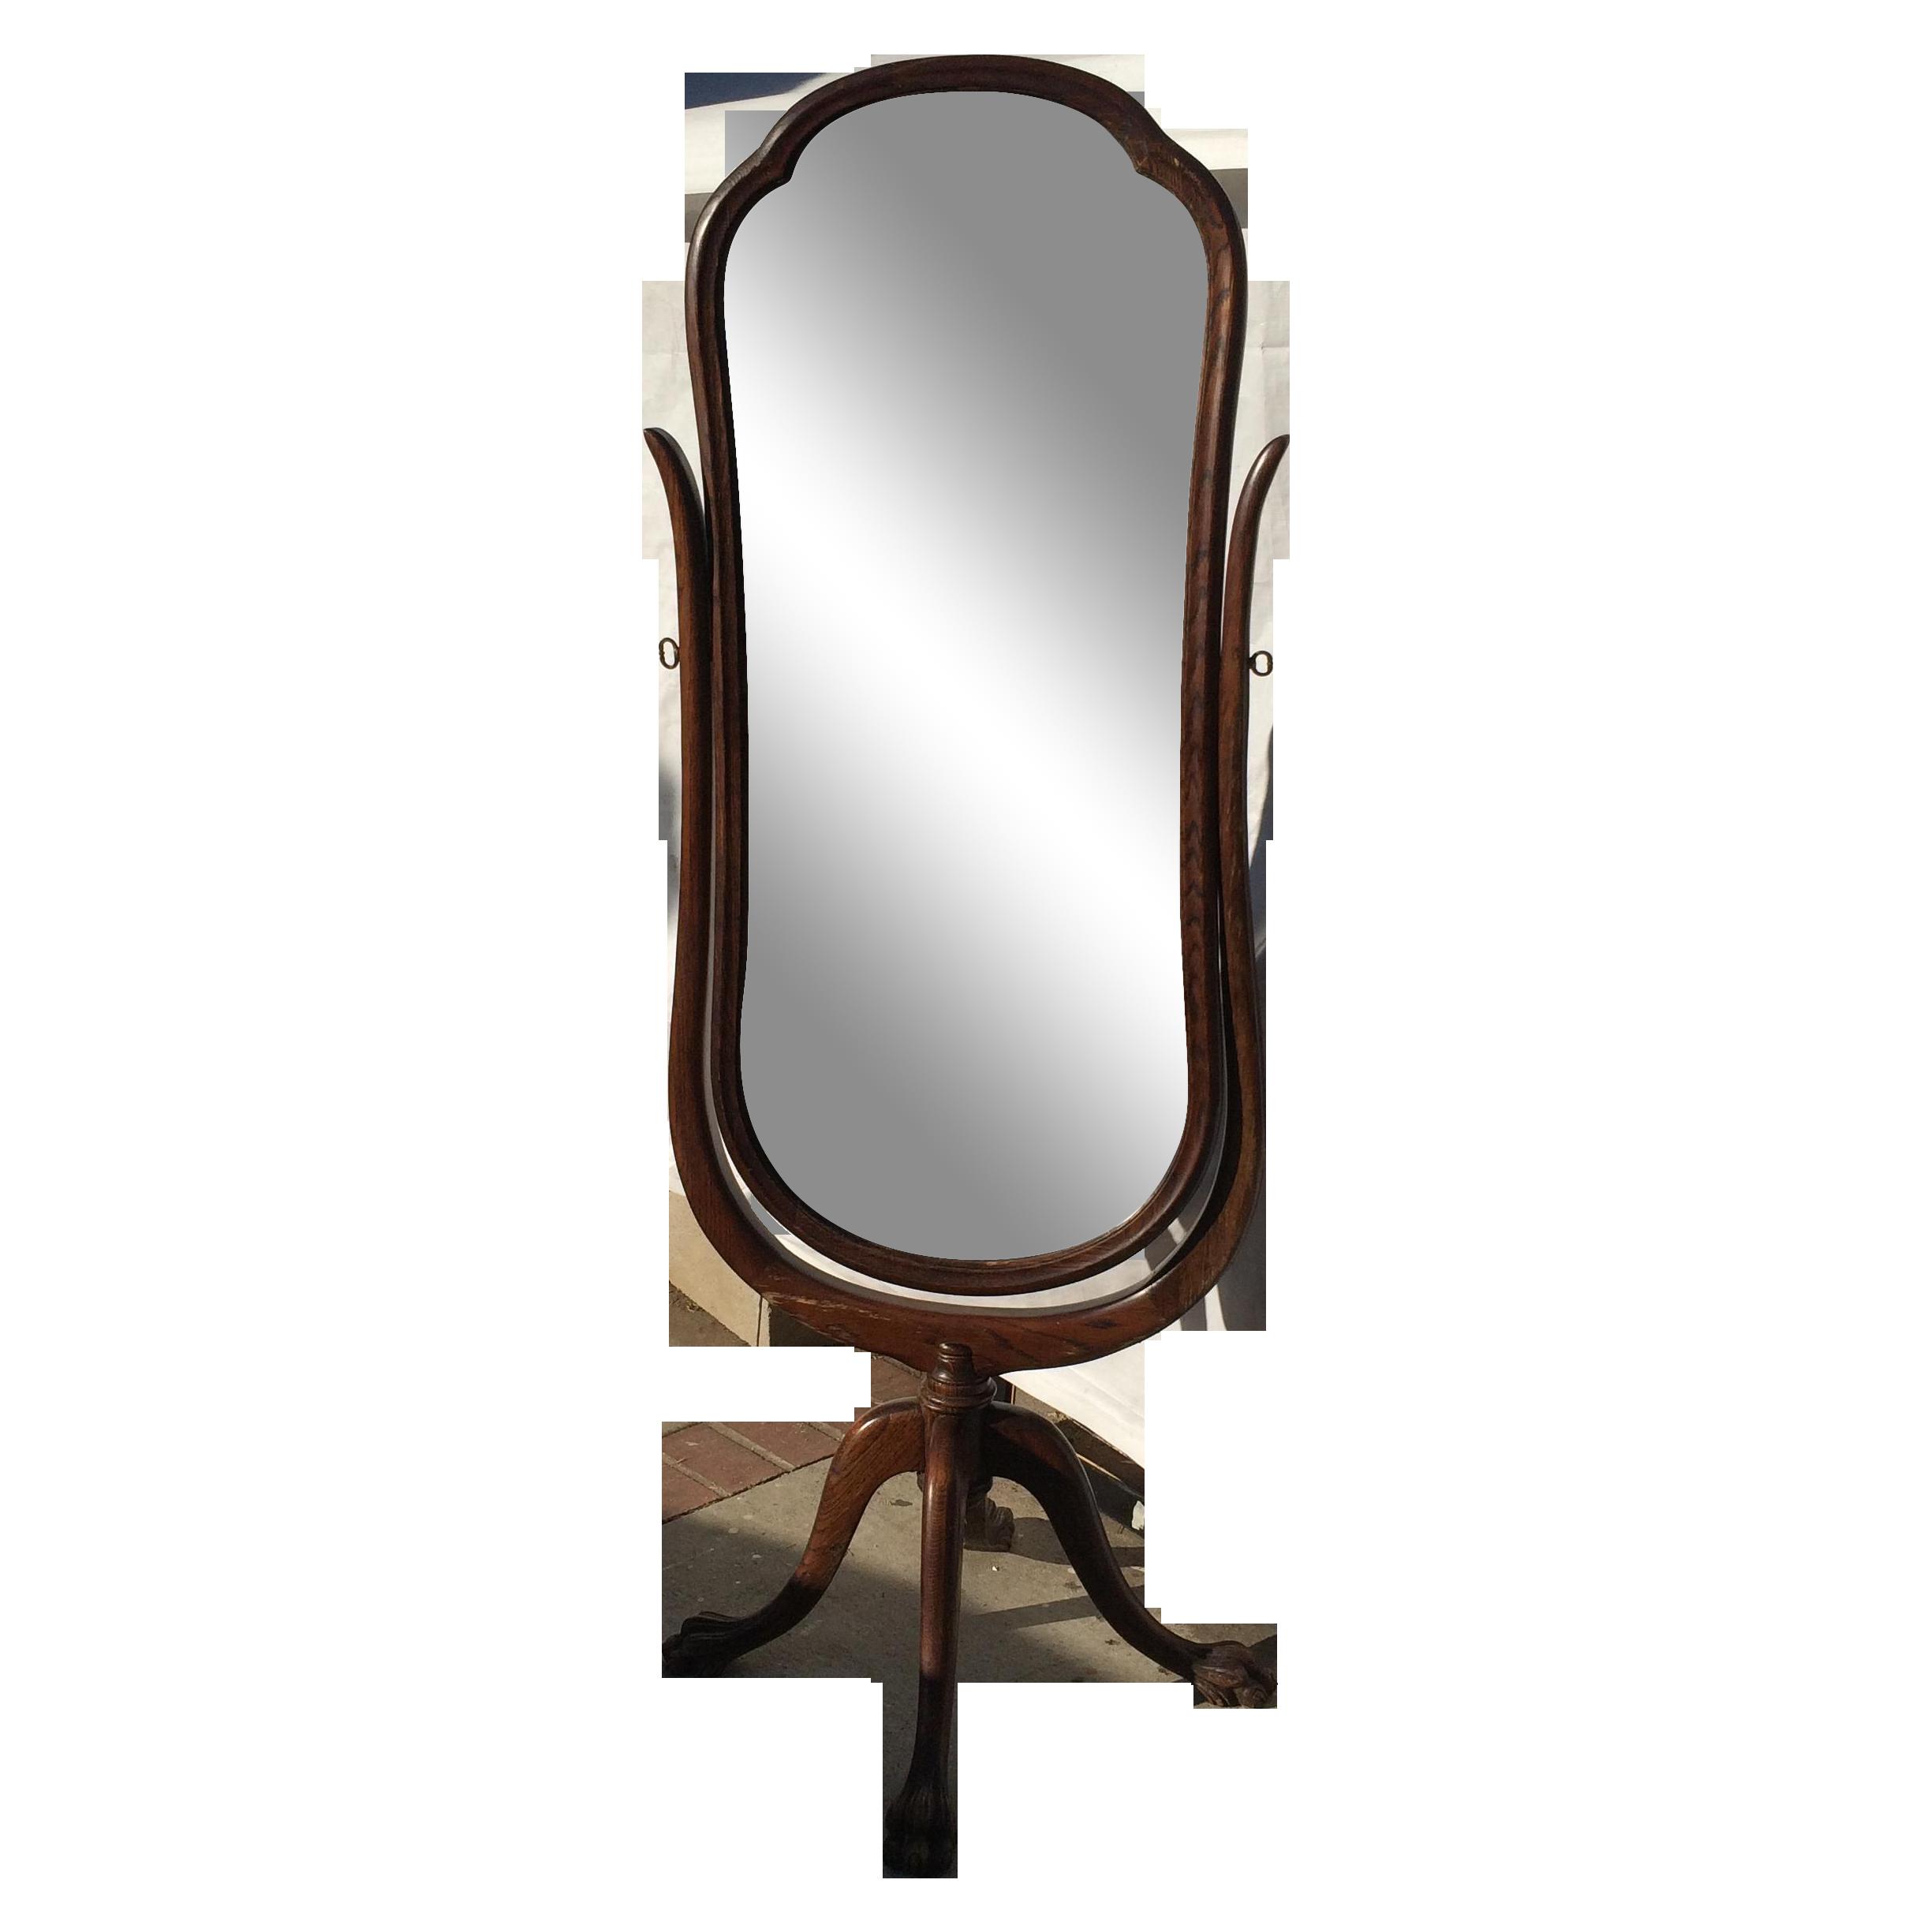 Antique Cheval Floor Standing Mirror on Chairish.com | Shabby Chic ...